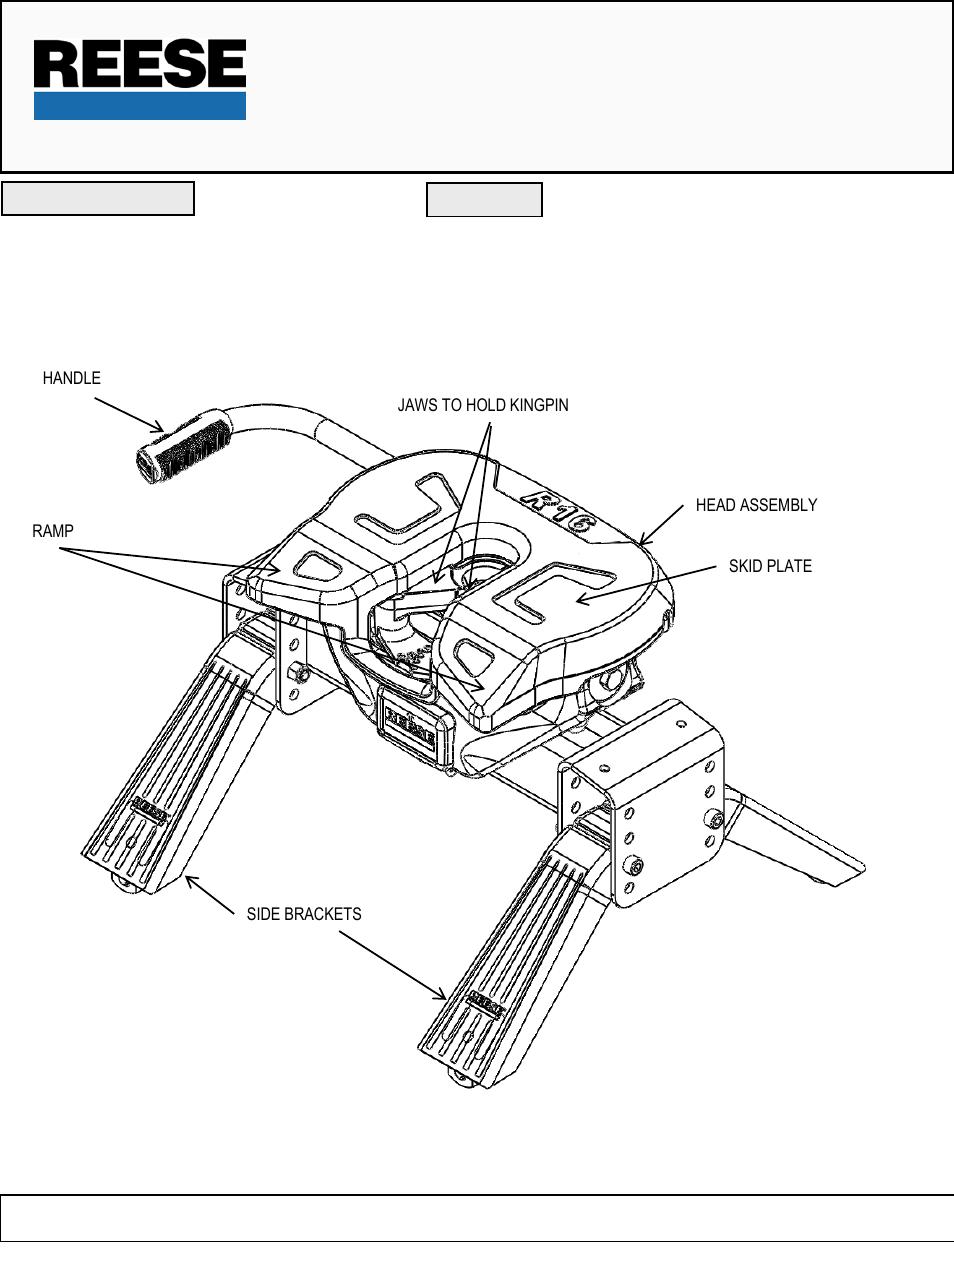 reese 16k 5th wheel hitch manual